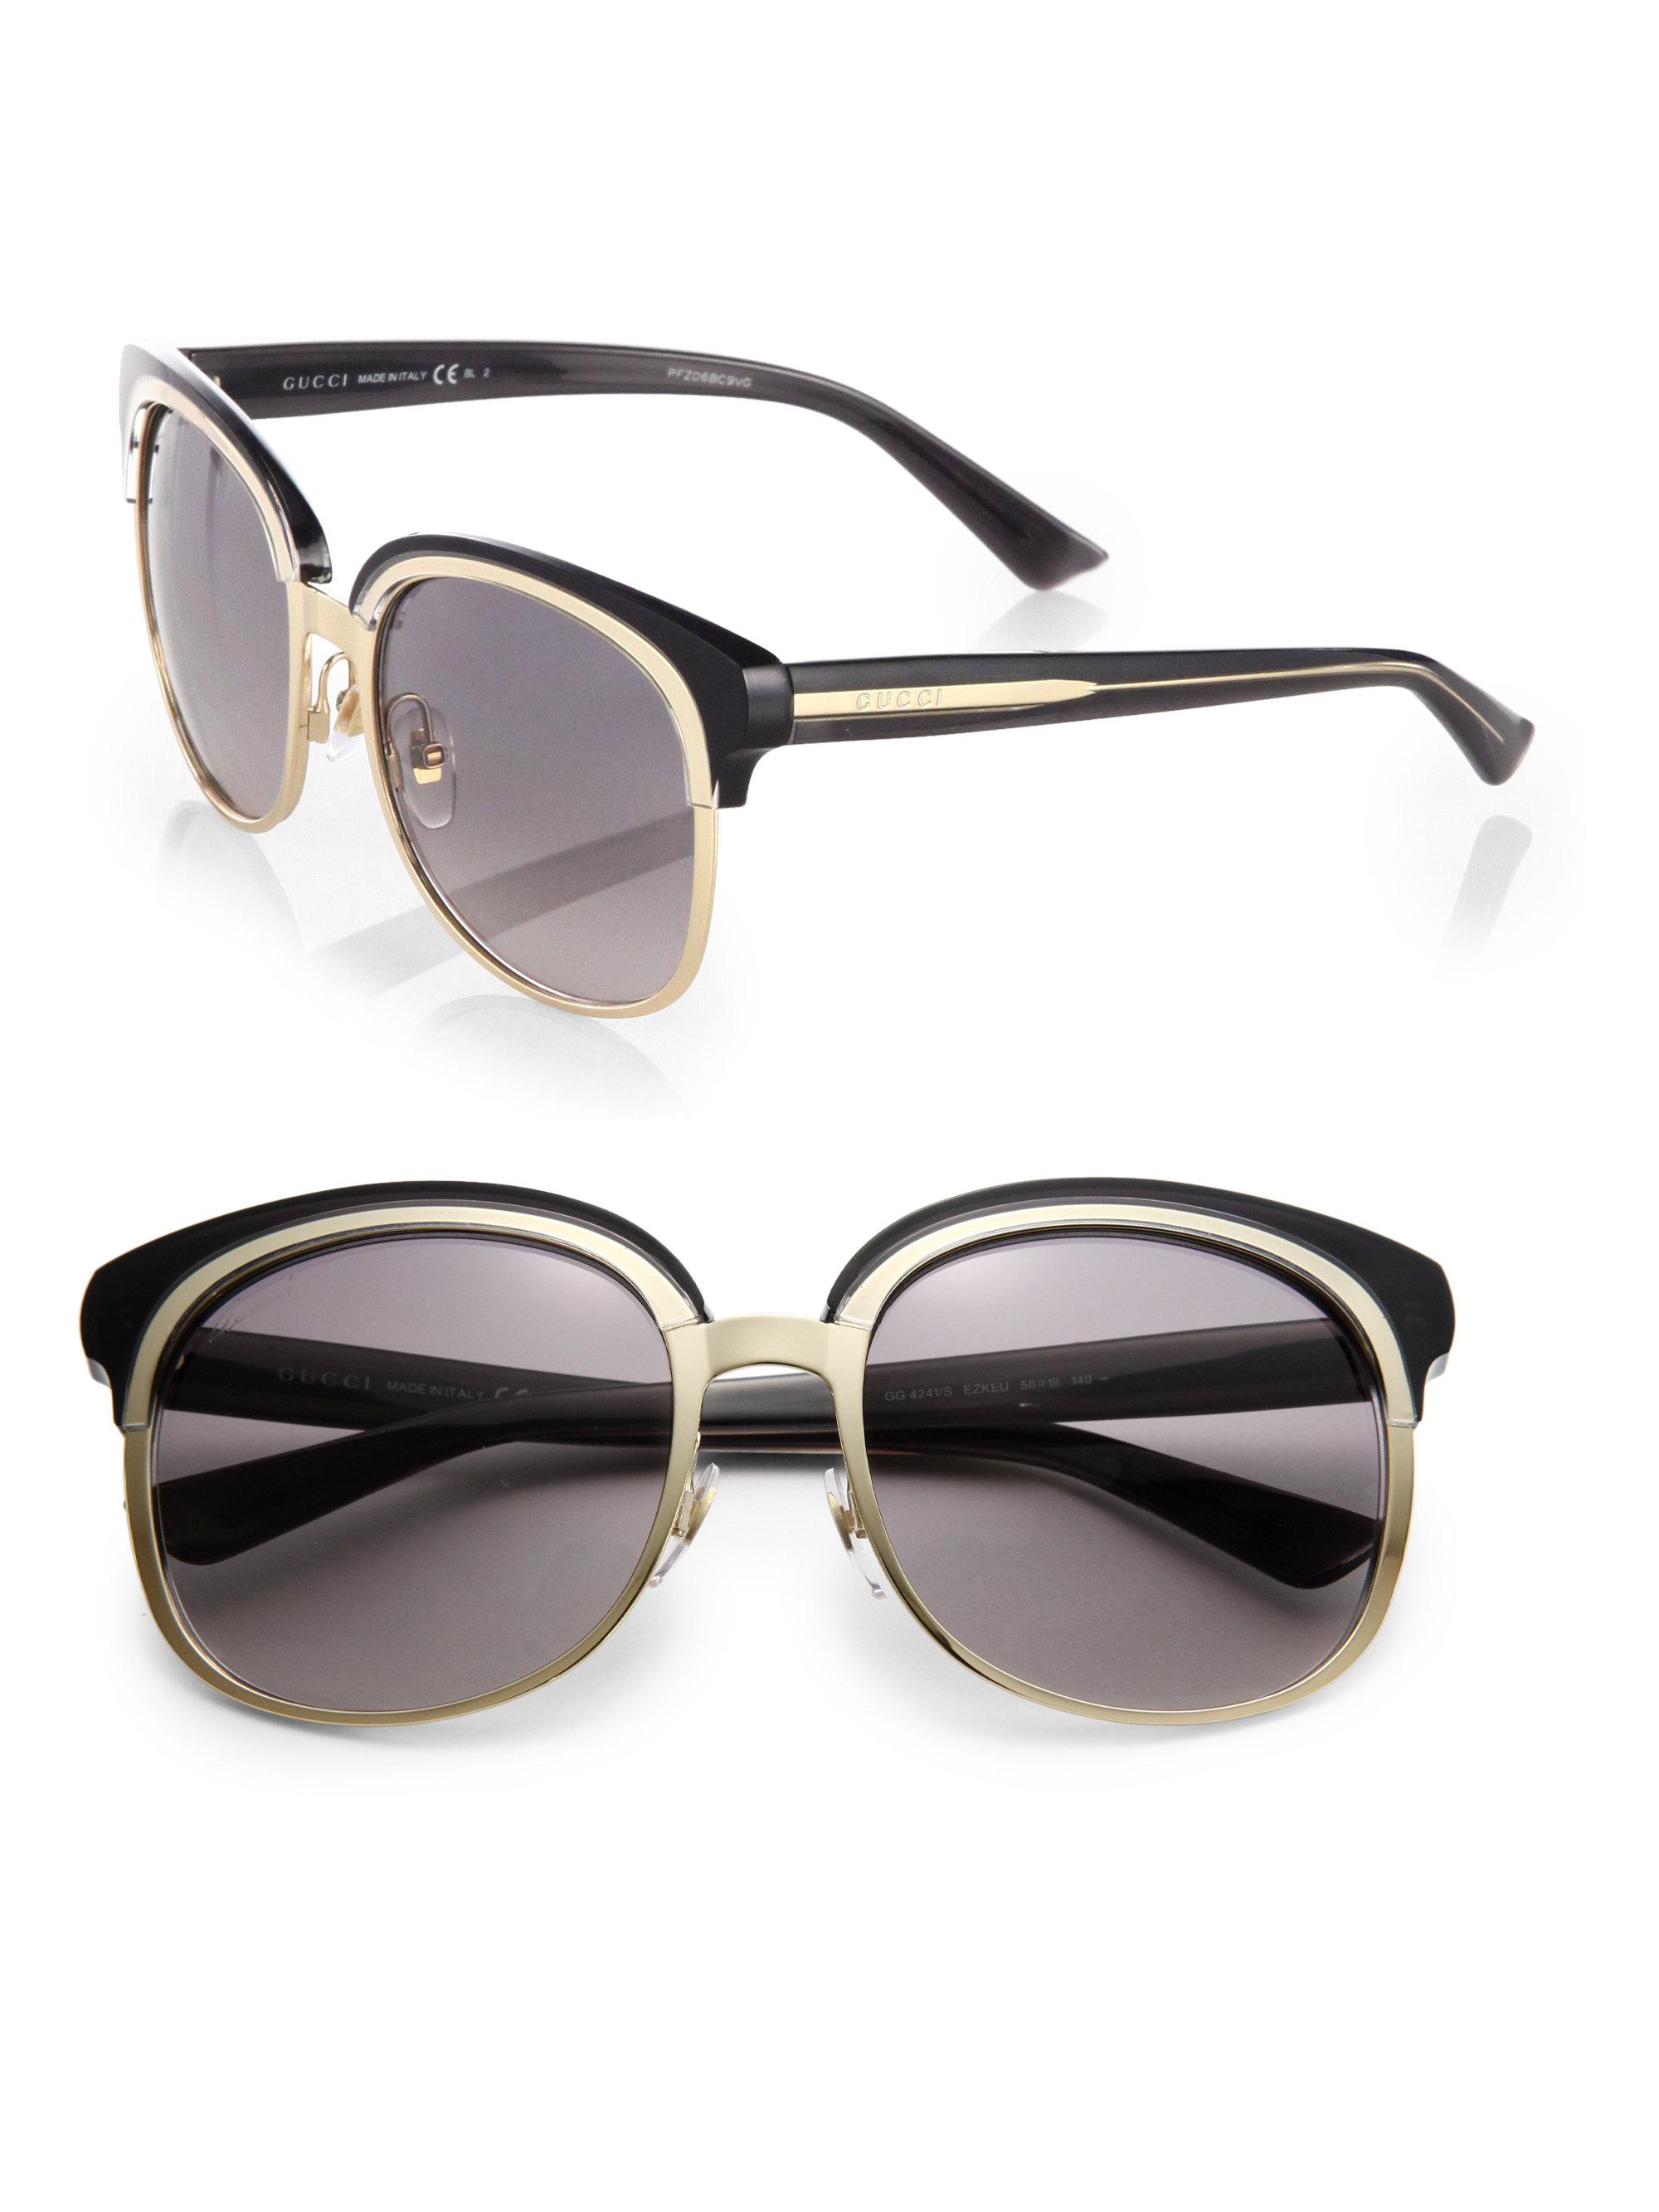 509e02c7019 Lyst - Gucci Oversized Plastic Metal Round Sunglasses in Metallic